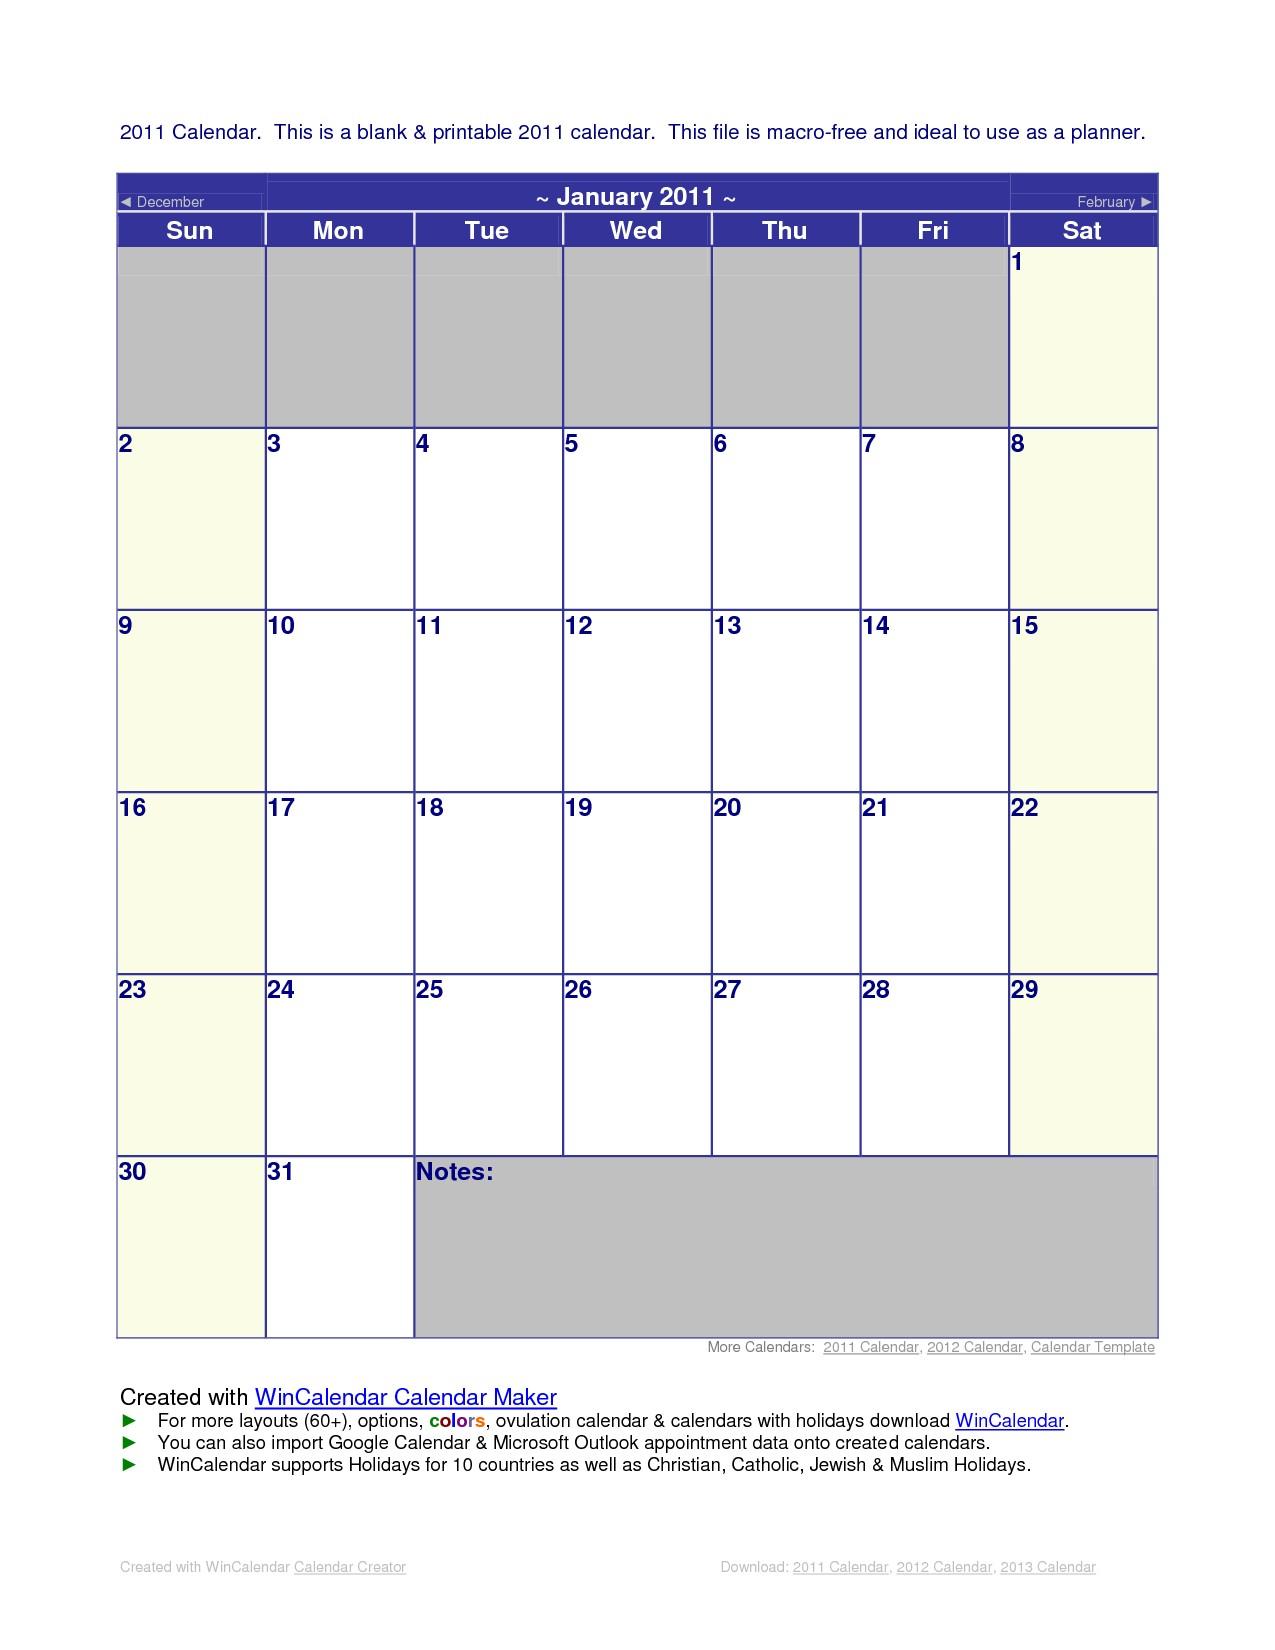 2011 Microsoft fice Calendar